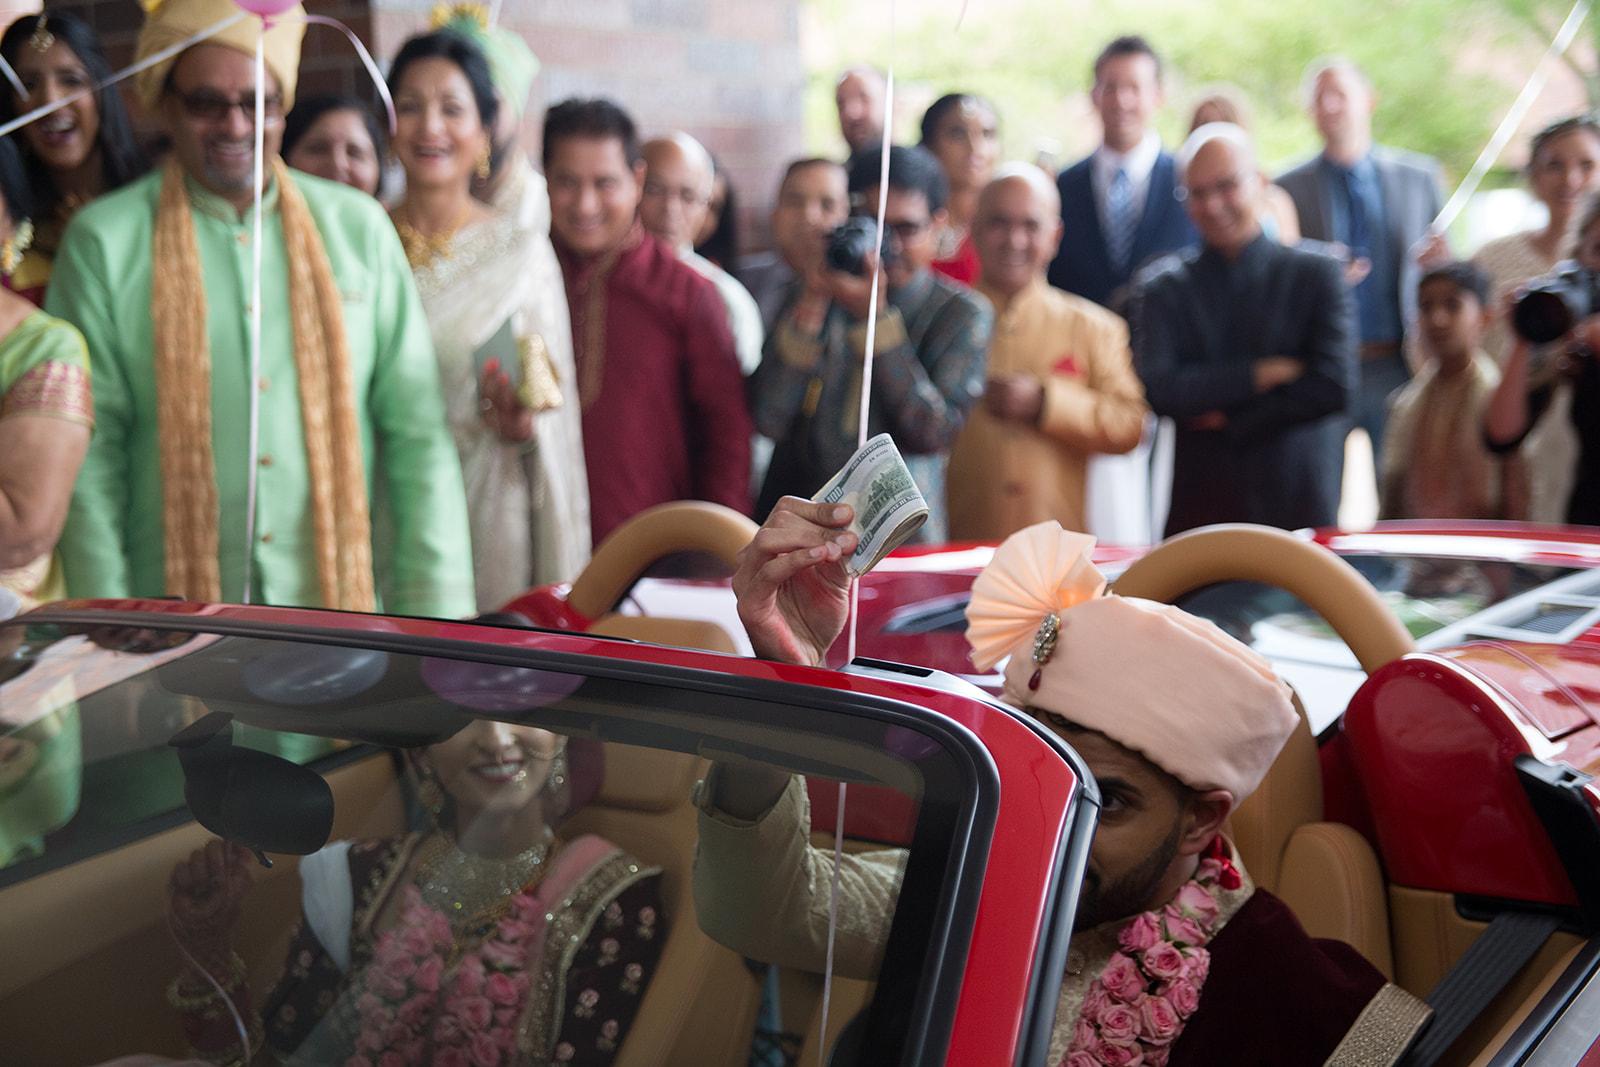 Le Cape Weddings - South Asian Wedding - Puja and Kheelan - Vidai A25.jpg